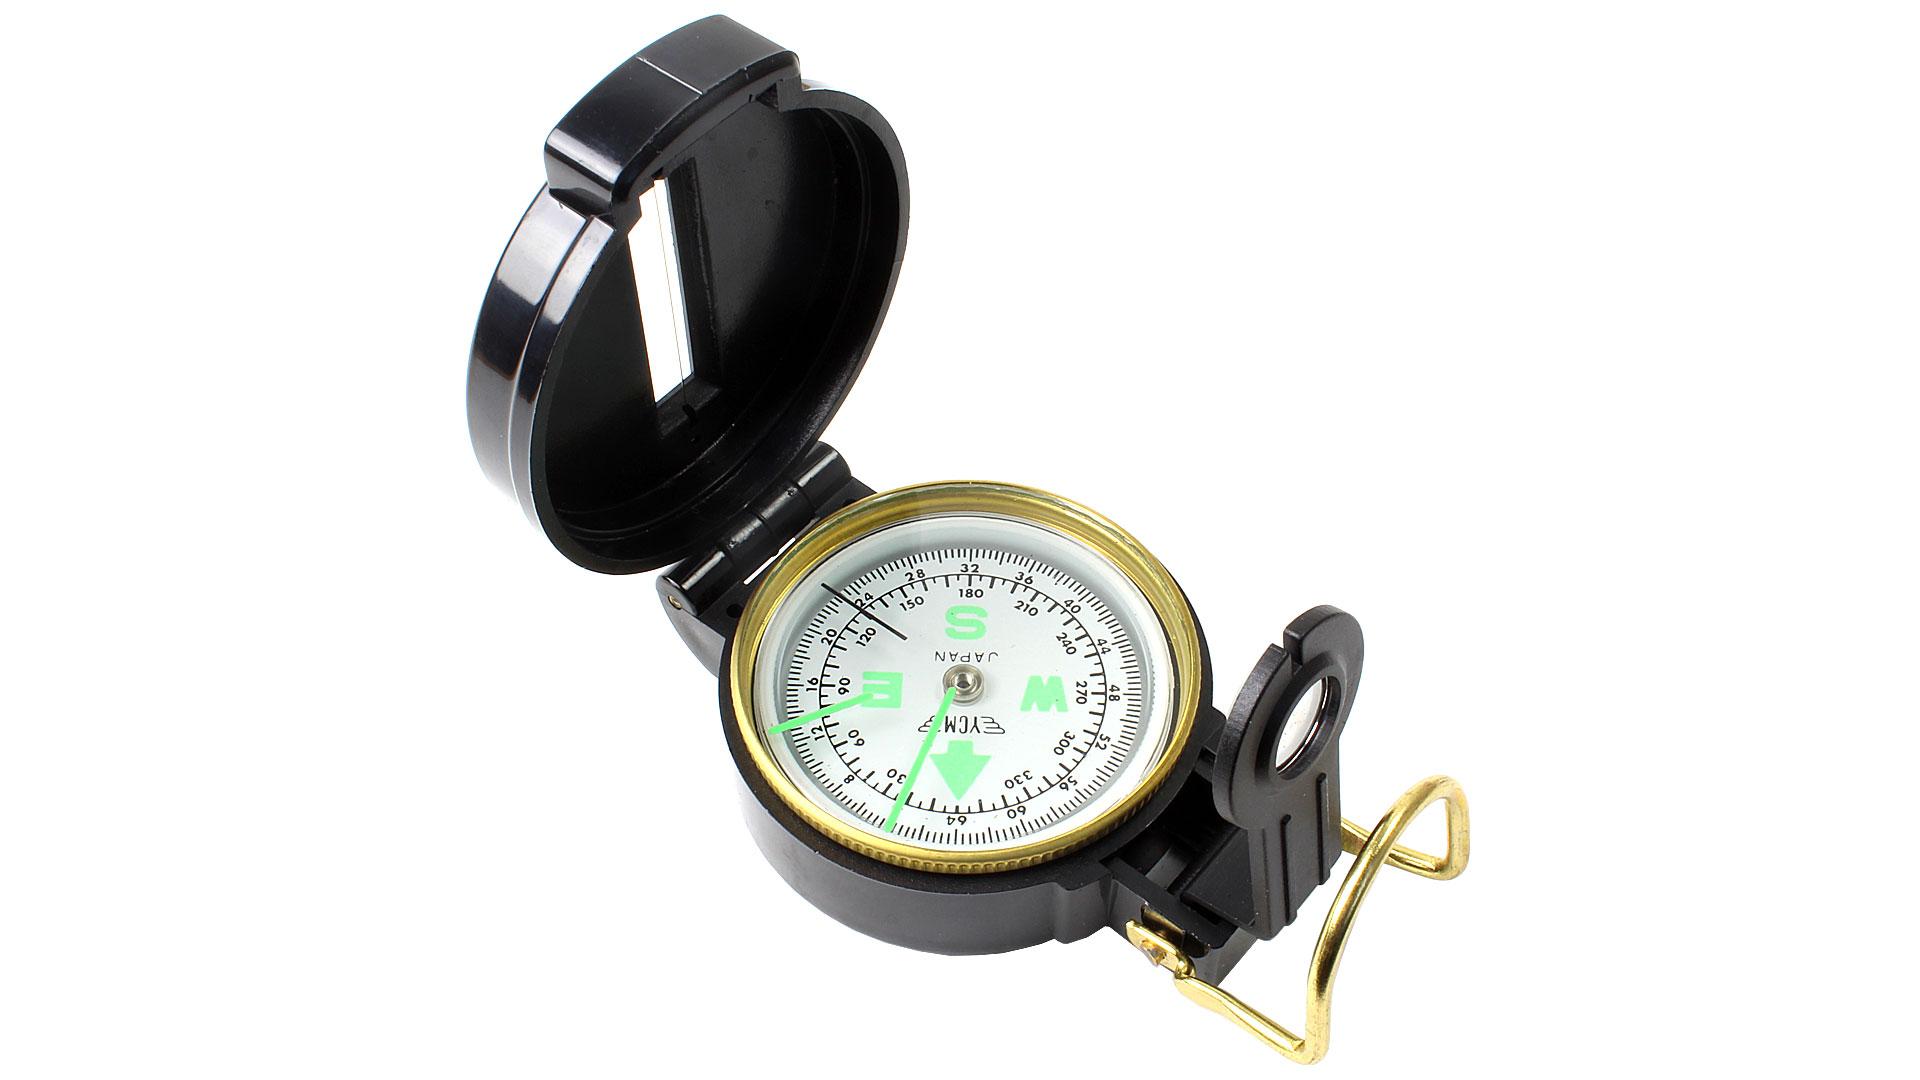 Laser Entfernungsmesser Mit Kompass : Kompass